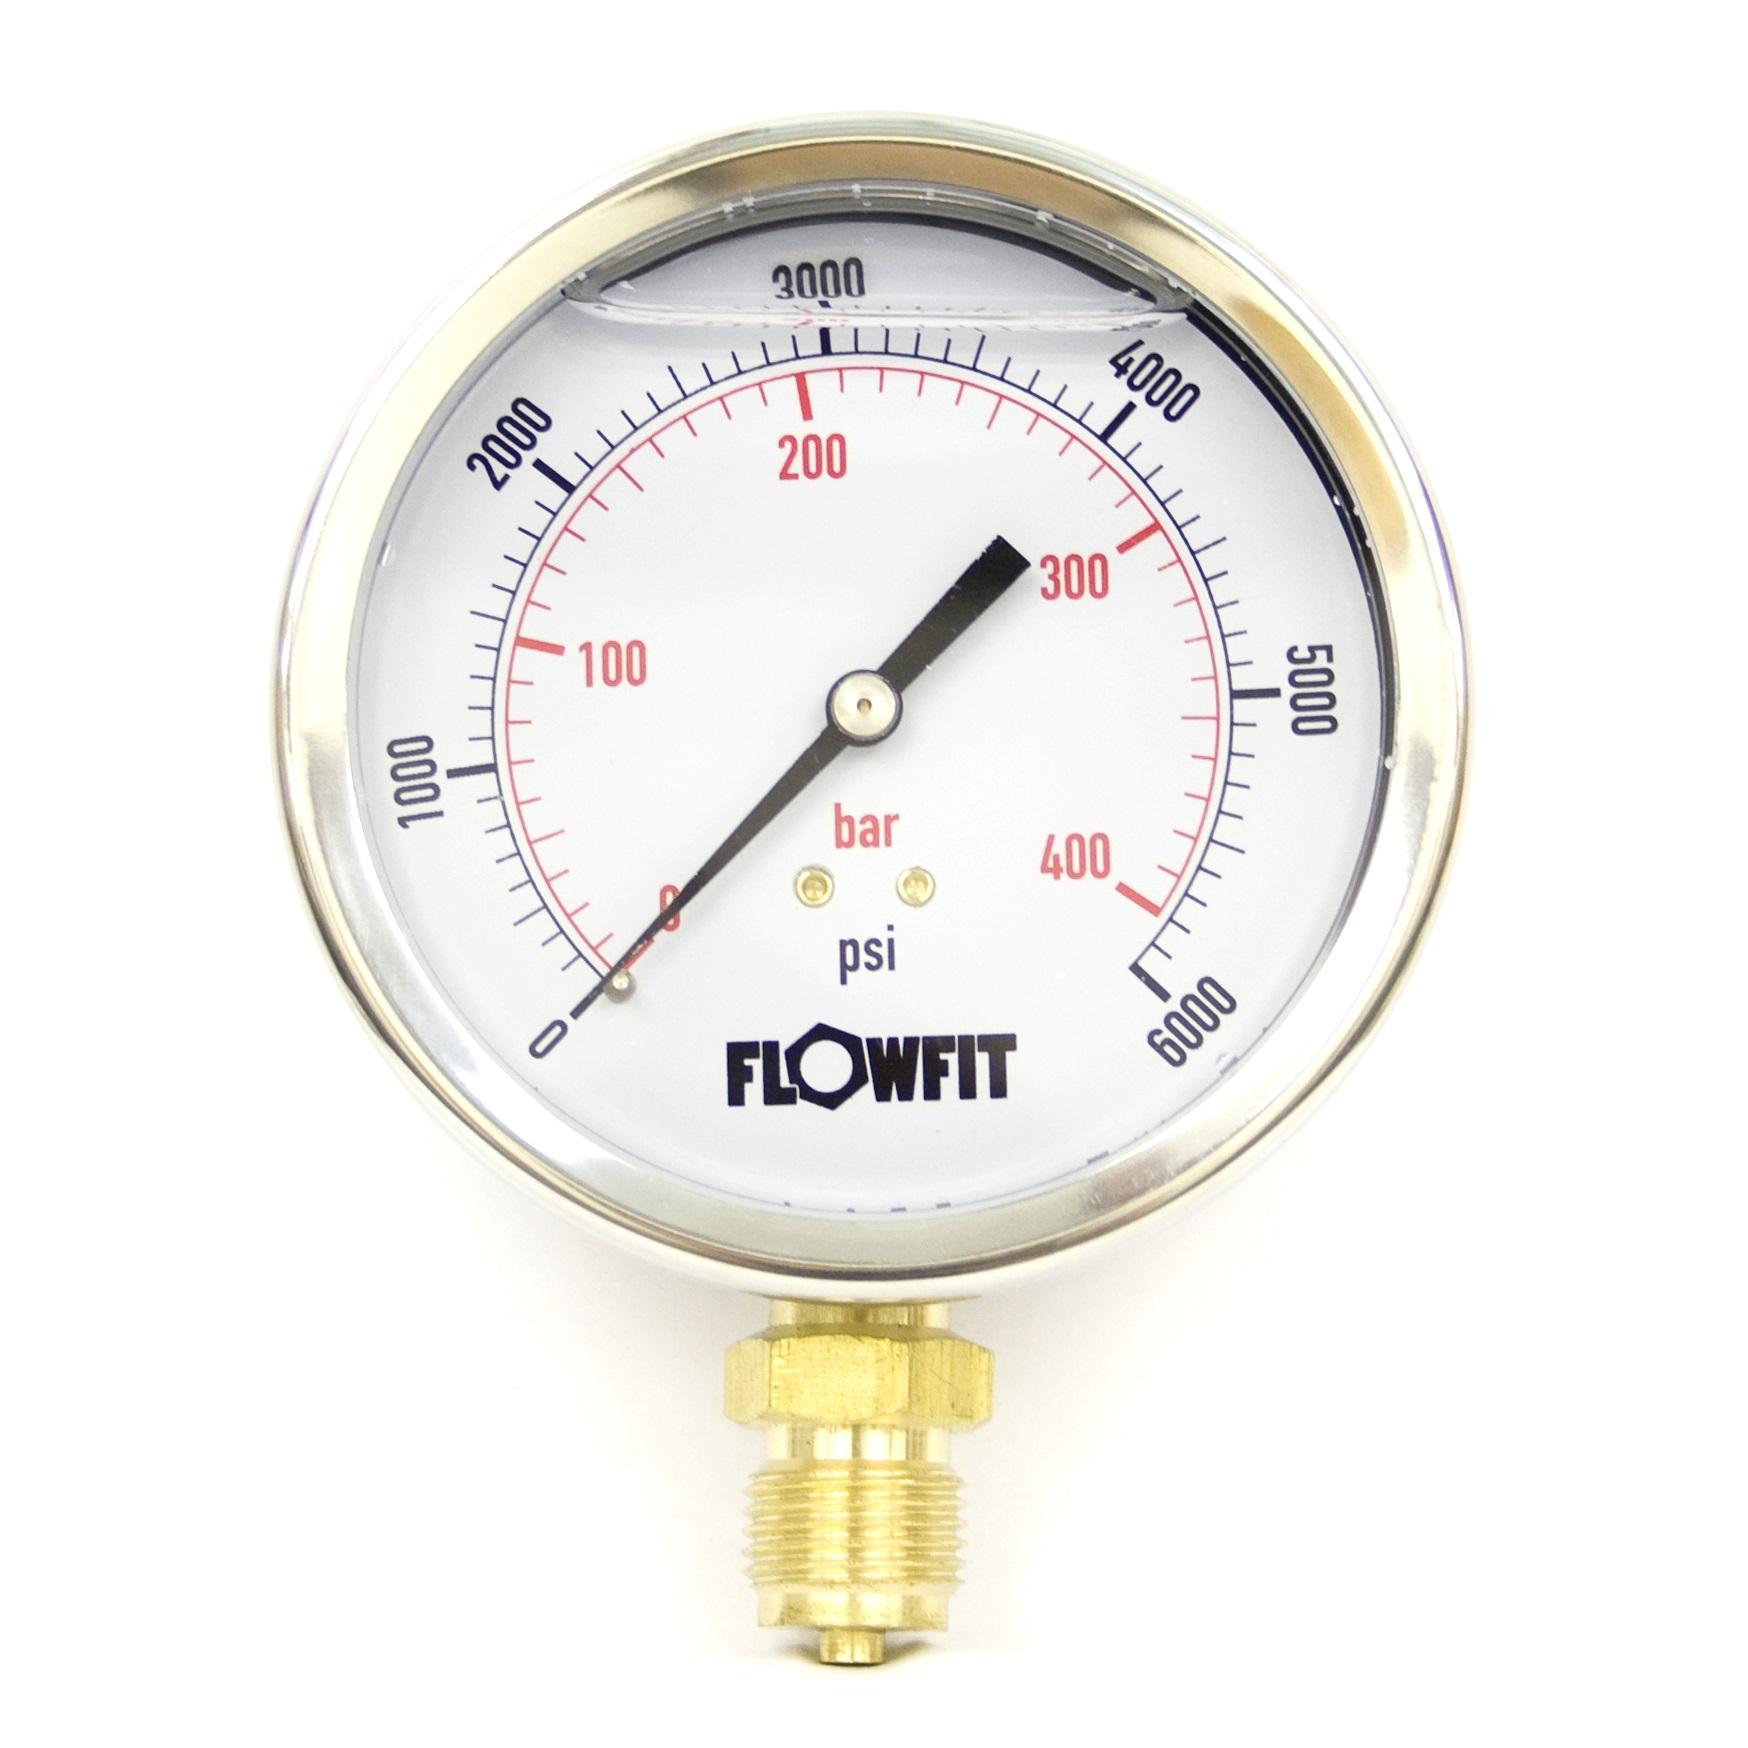 Hydraulic Pressure Meter : Mm glycerine filled hydraulic pressure gauge psi